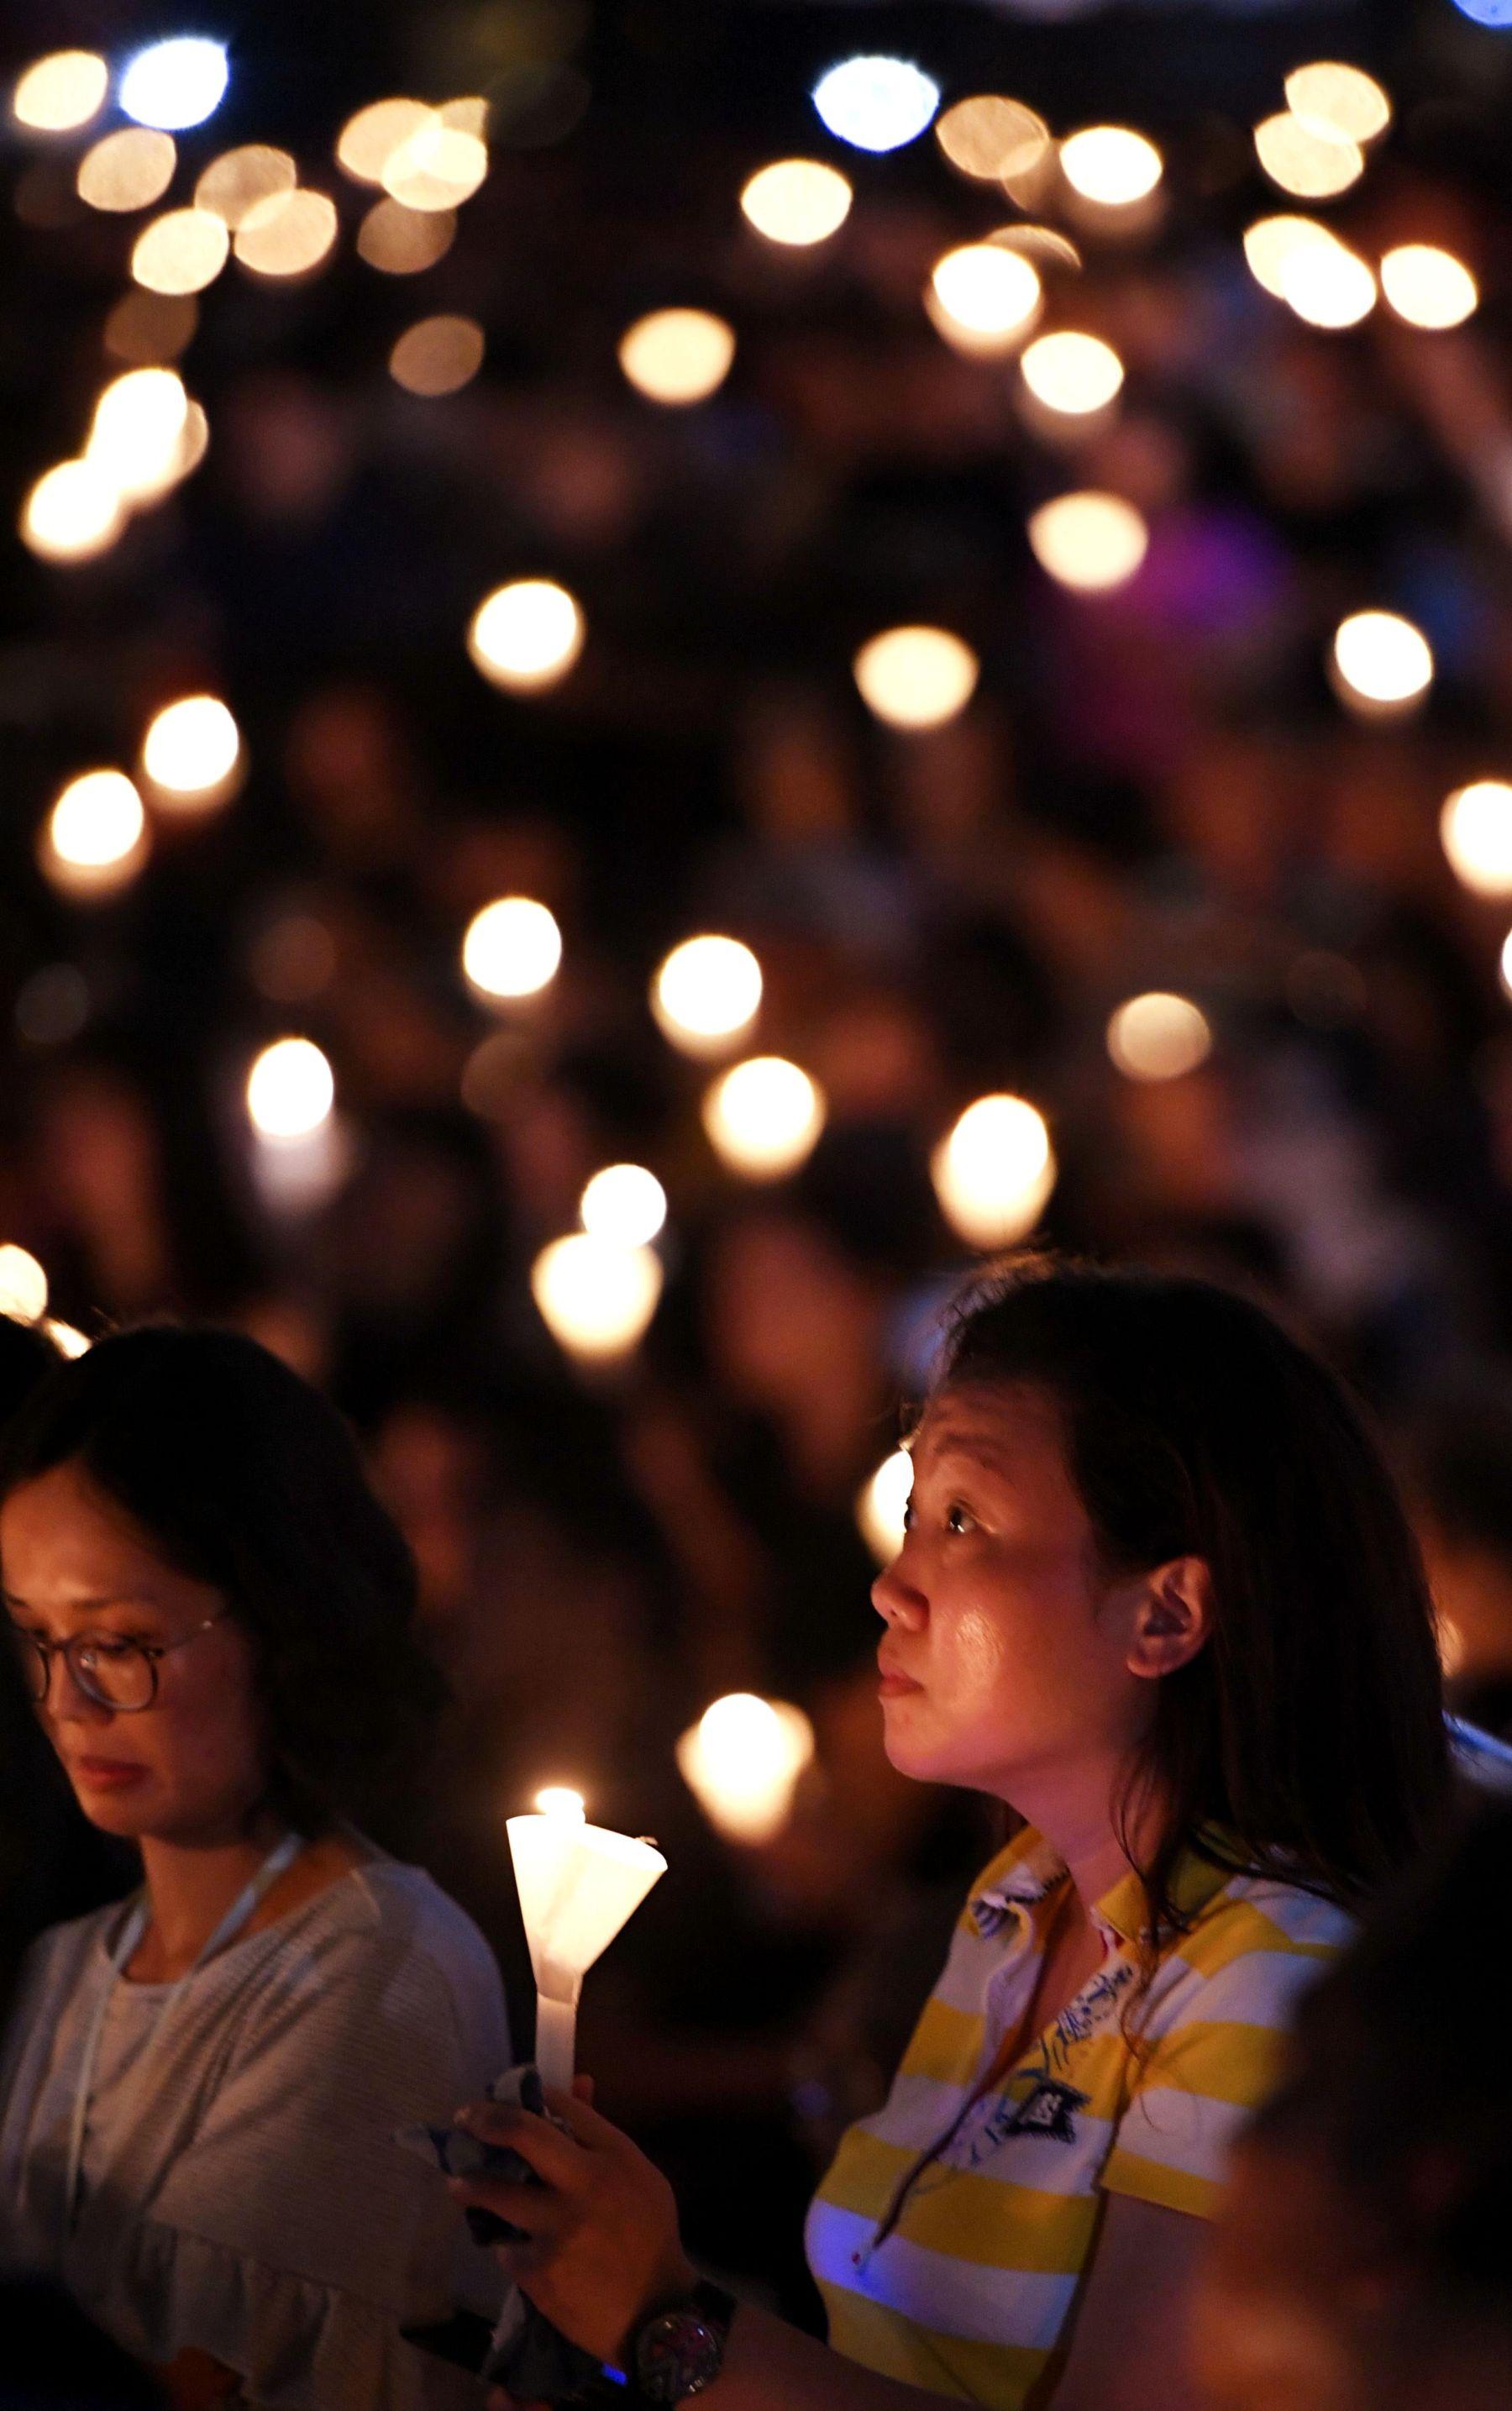 China Beijing 30th Anniversary of Tiananmen Square Incident 029